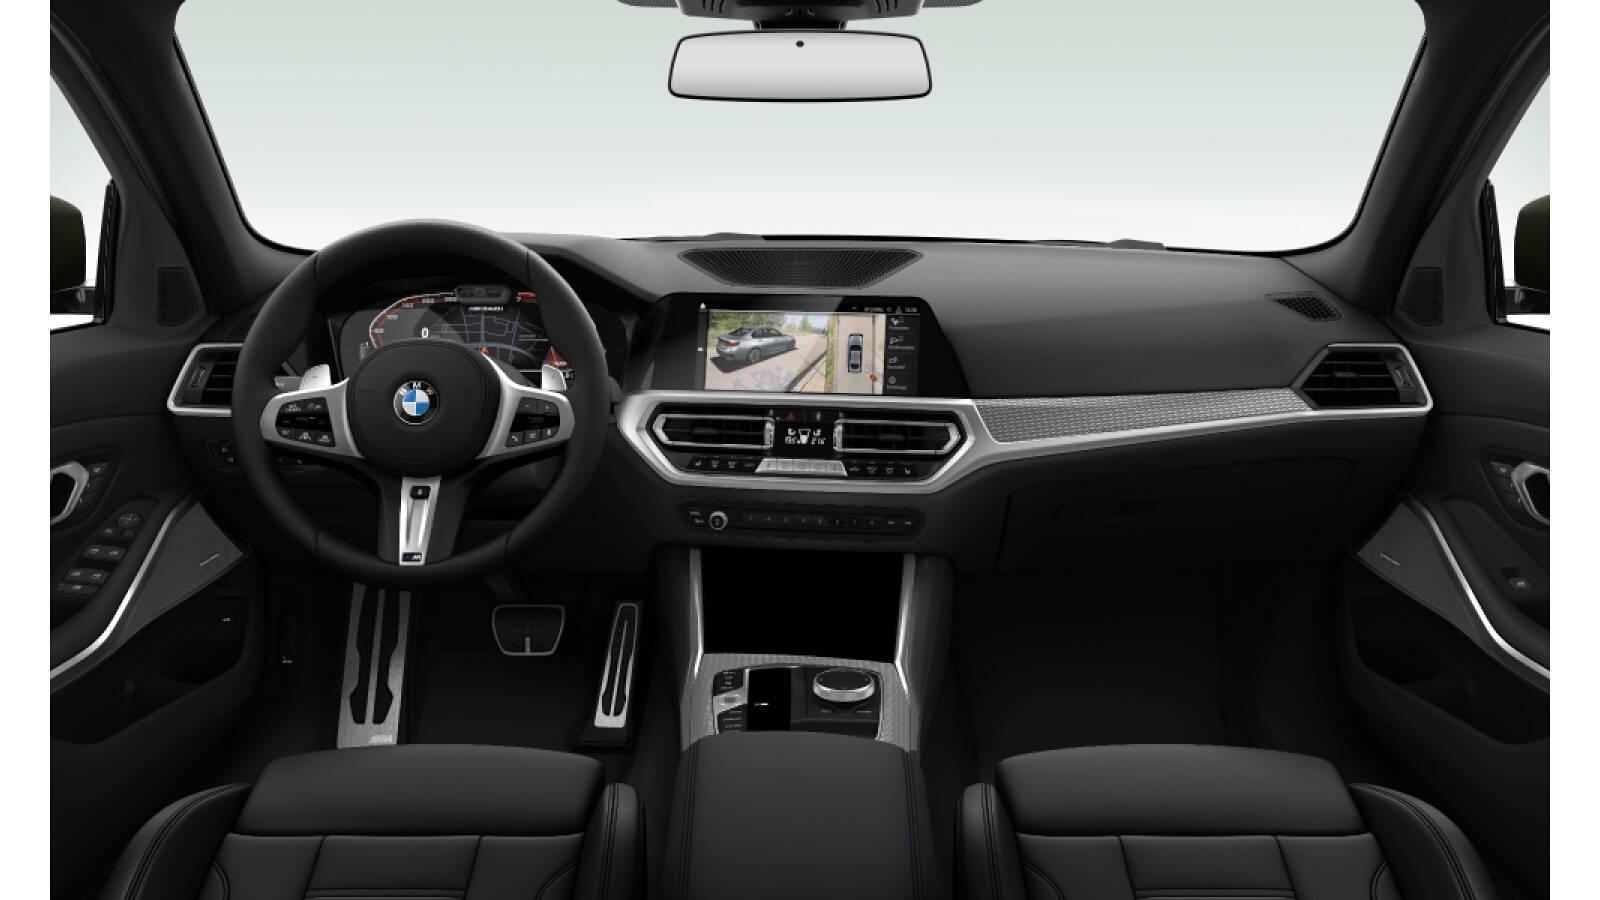 BMW 3 Series 2019 leaked photos (33)